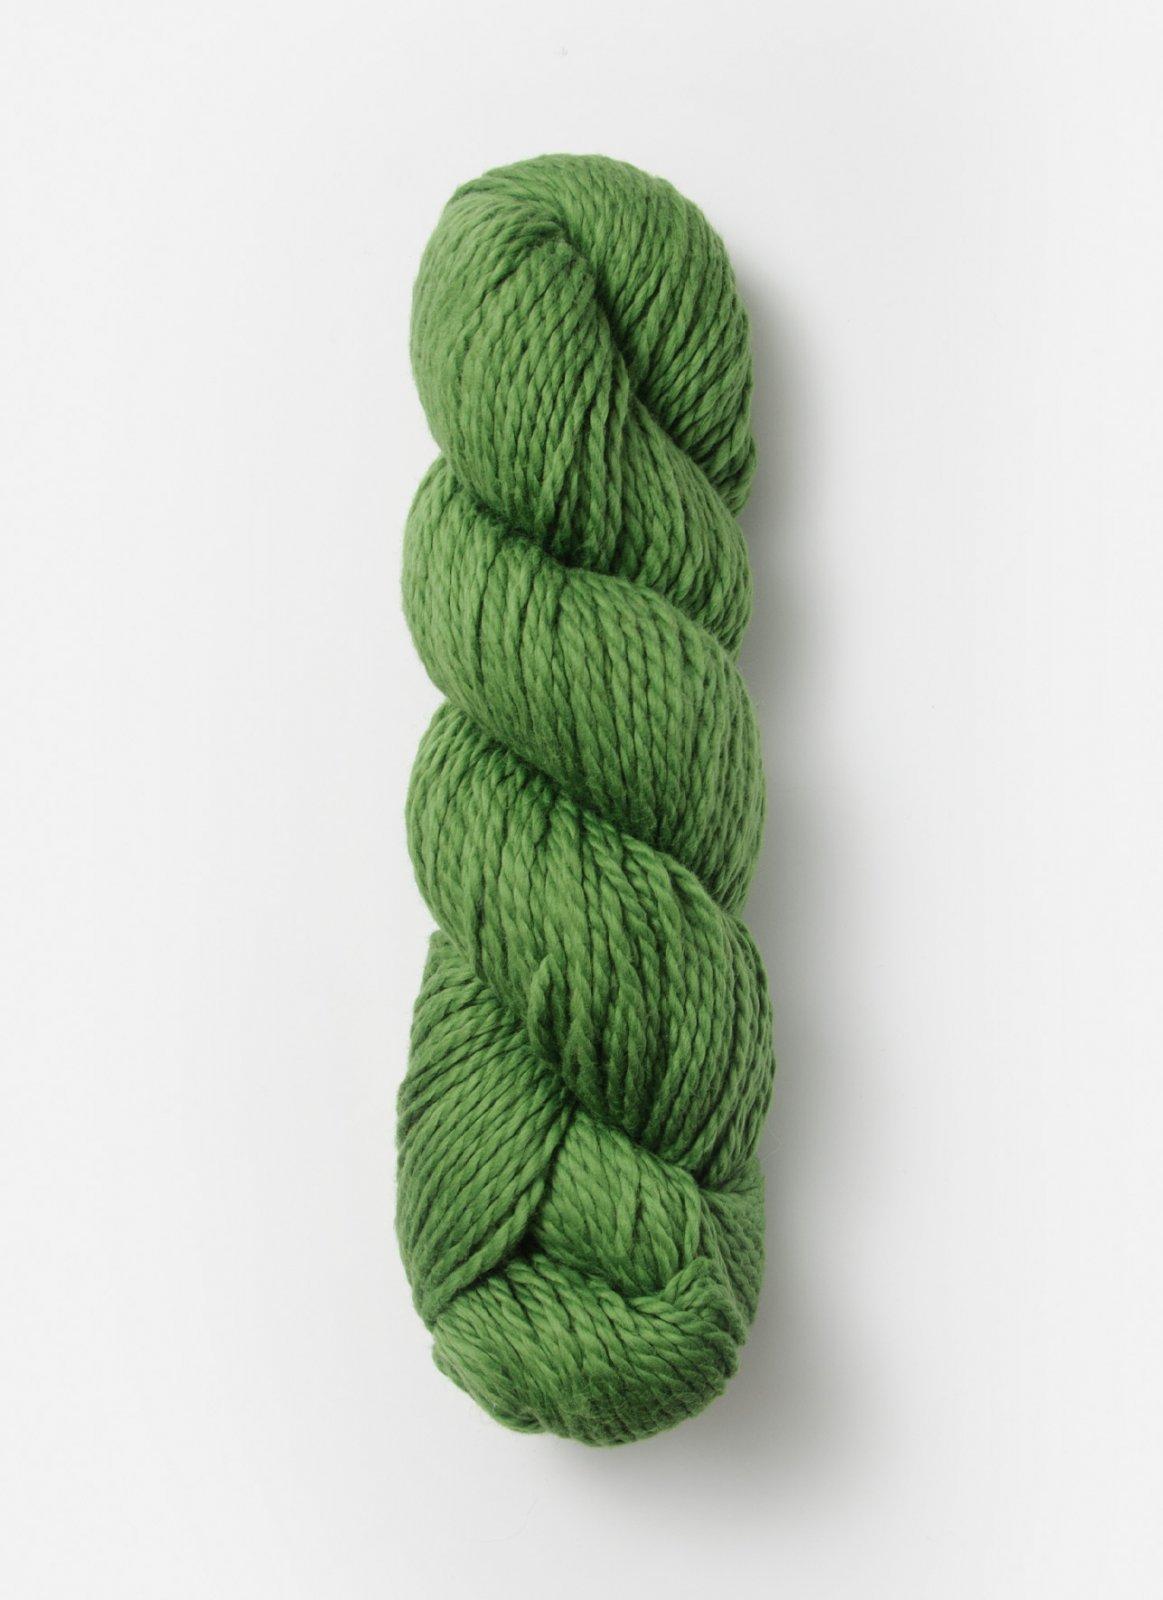 Blue Sky Organic Cotton - Pickle